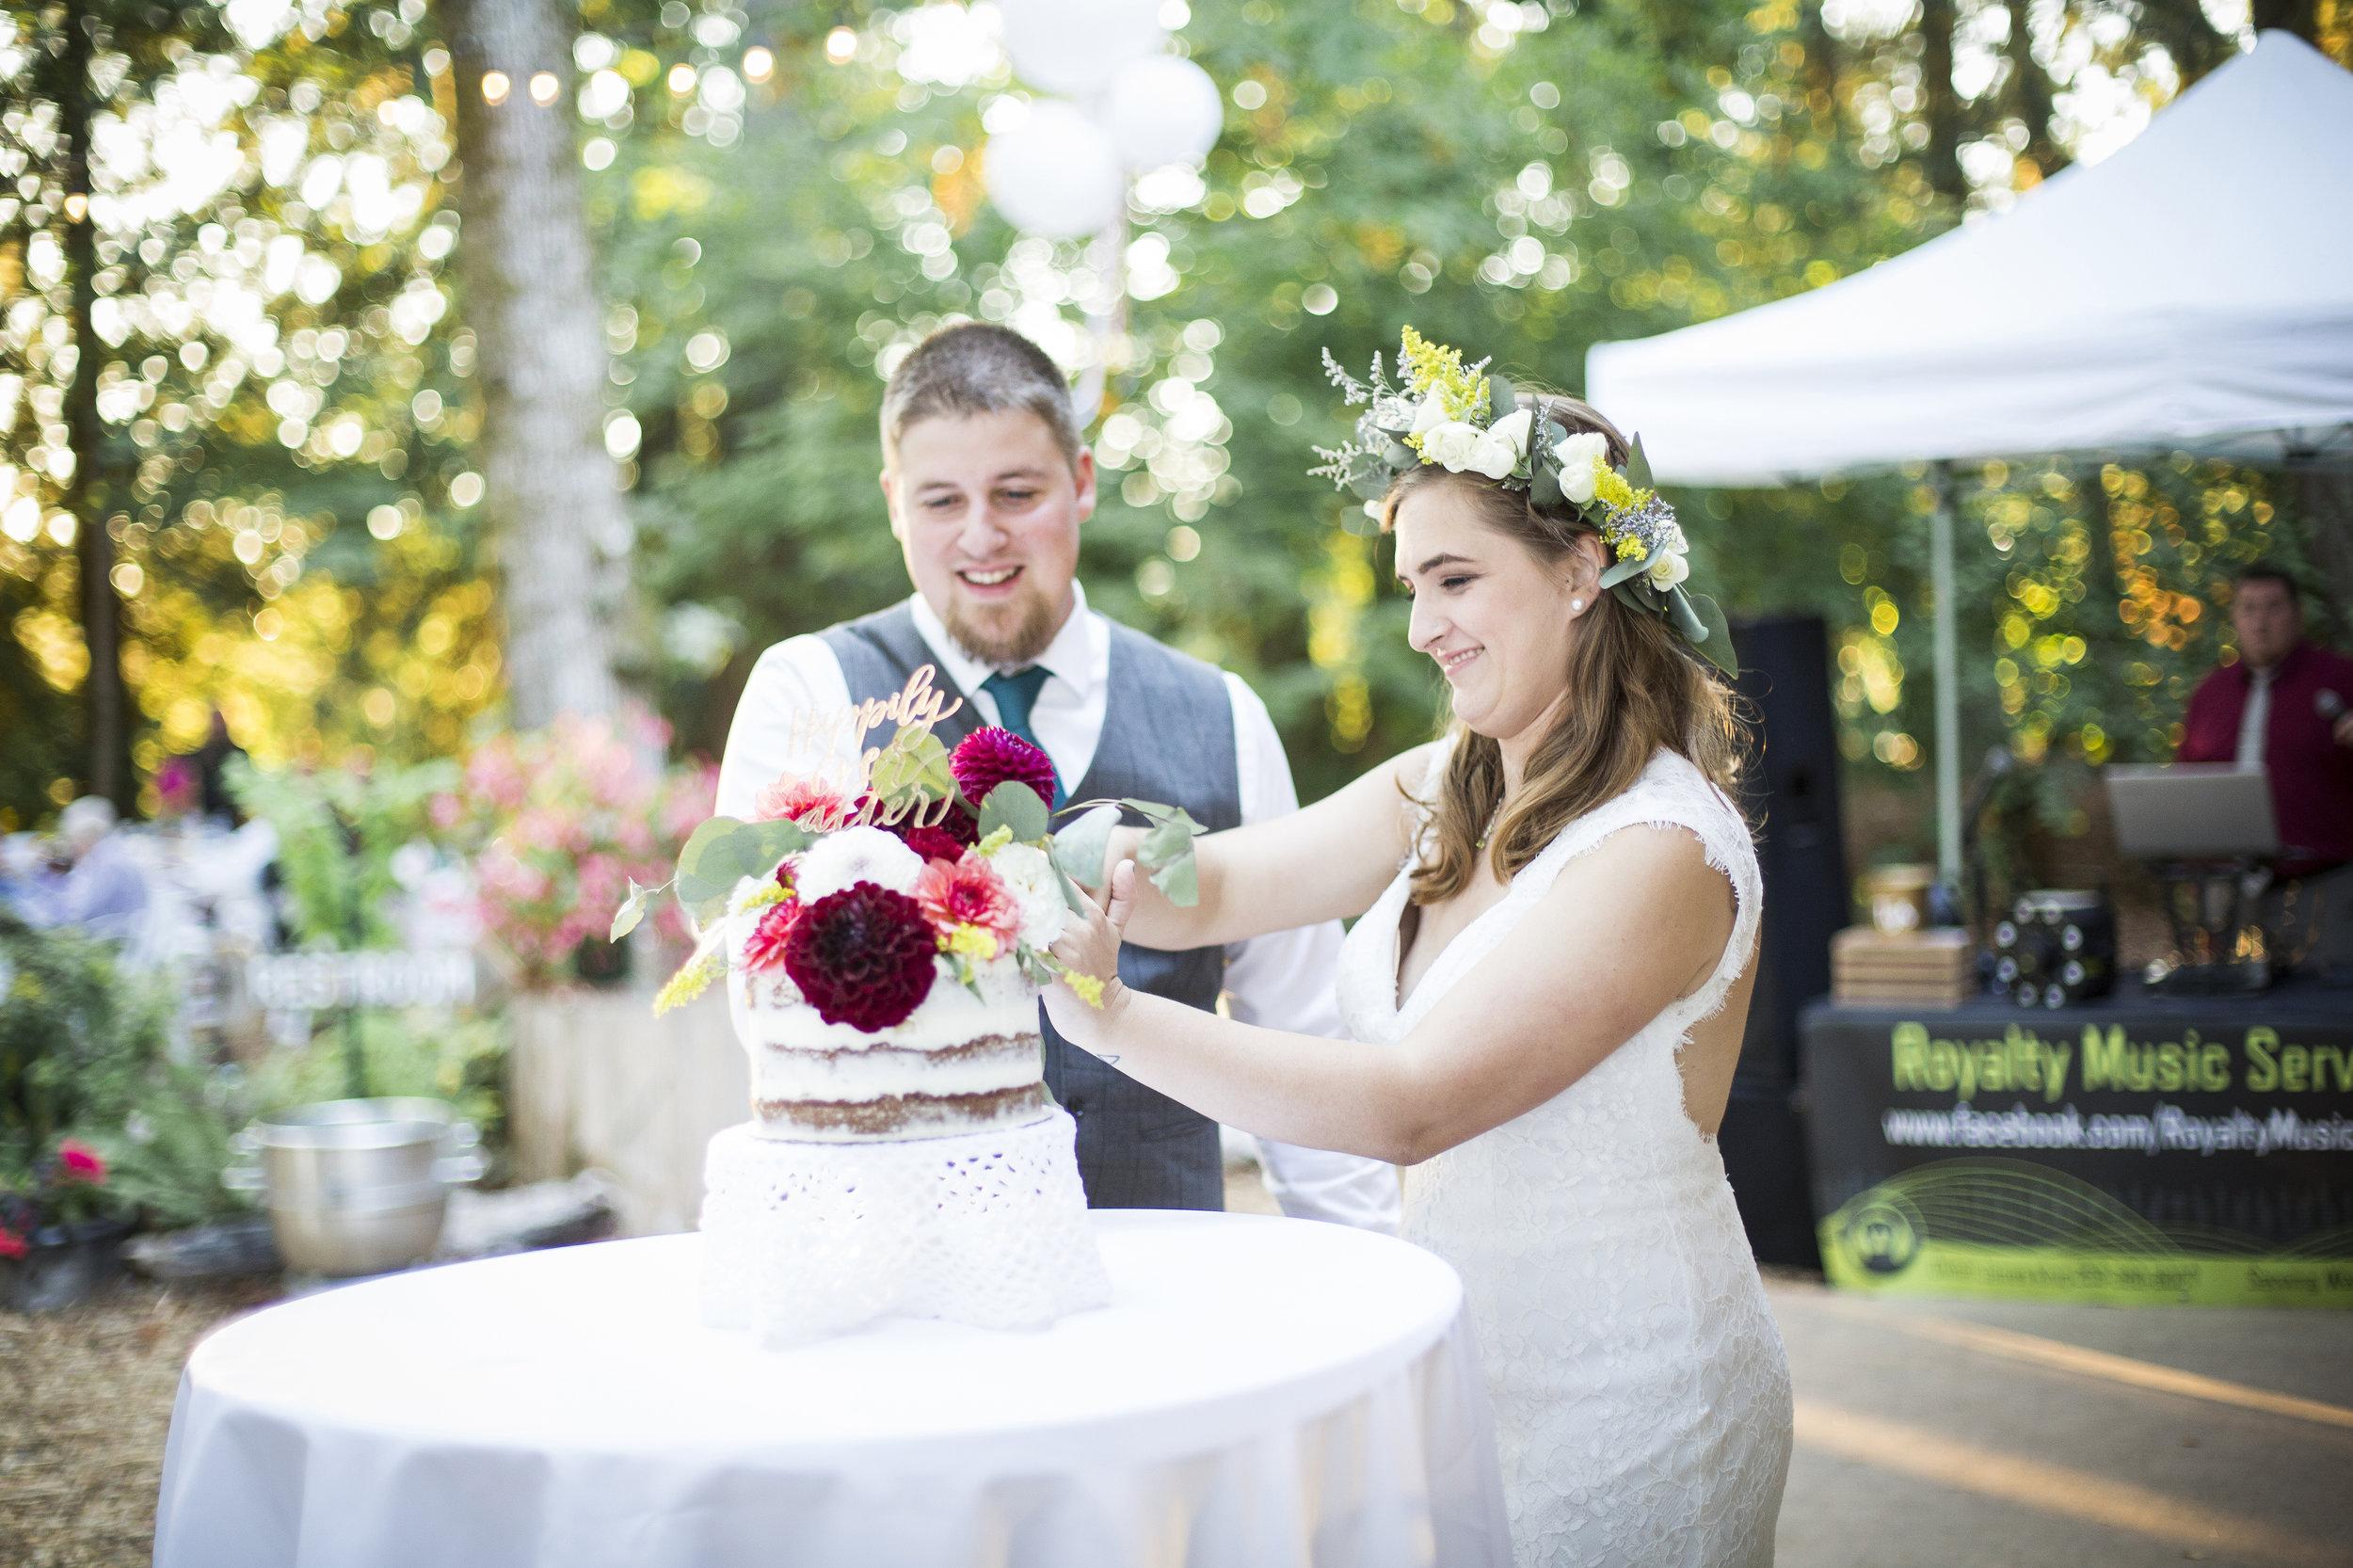 Seattle-Tacoma-Wedding-Photographer-Jaeda-Reed-Fall-Glenwood-Tree-Farm-18.jpg